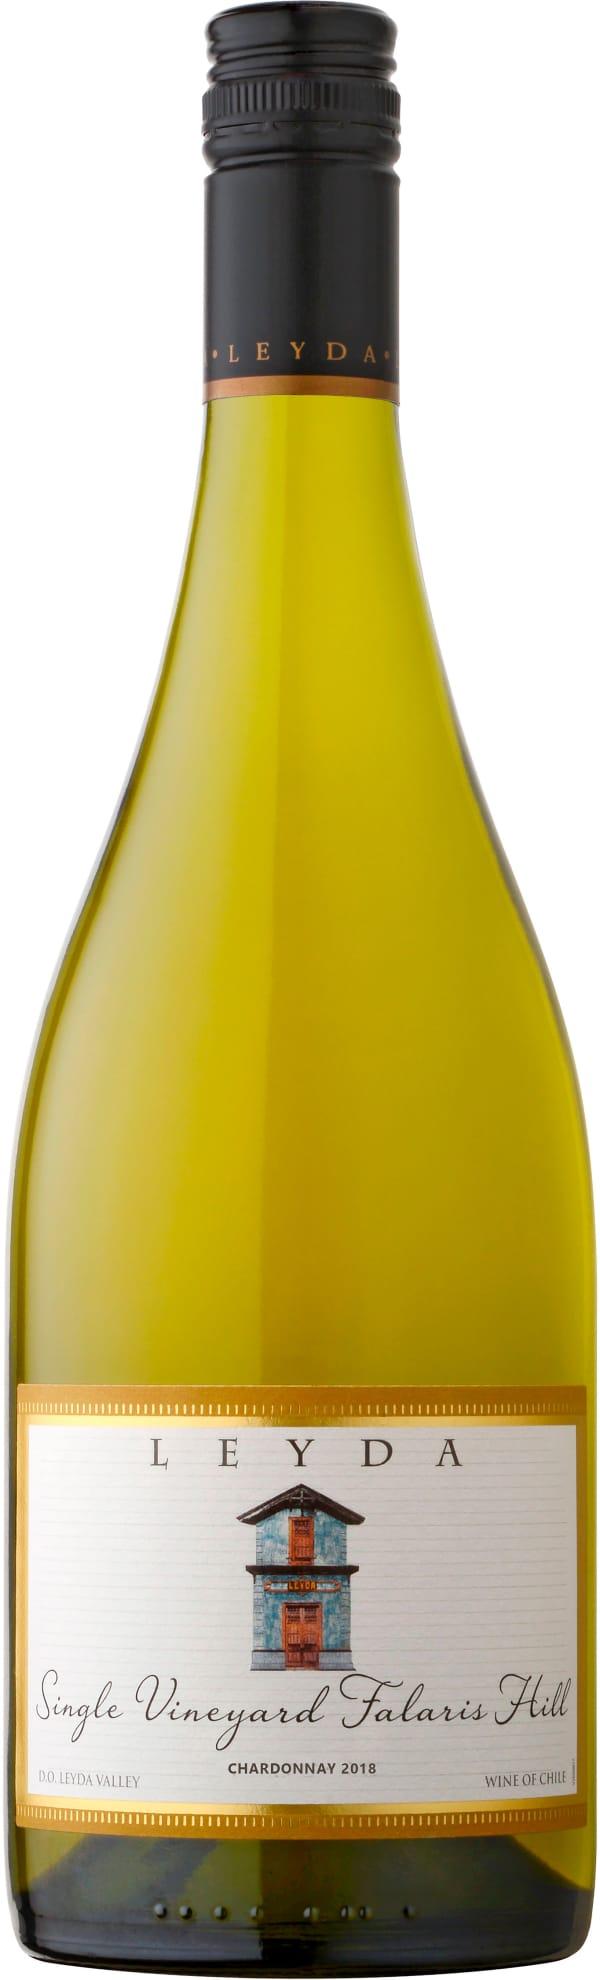 Leyda Single Vineyard Falaris Hill Chardonnay 2018